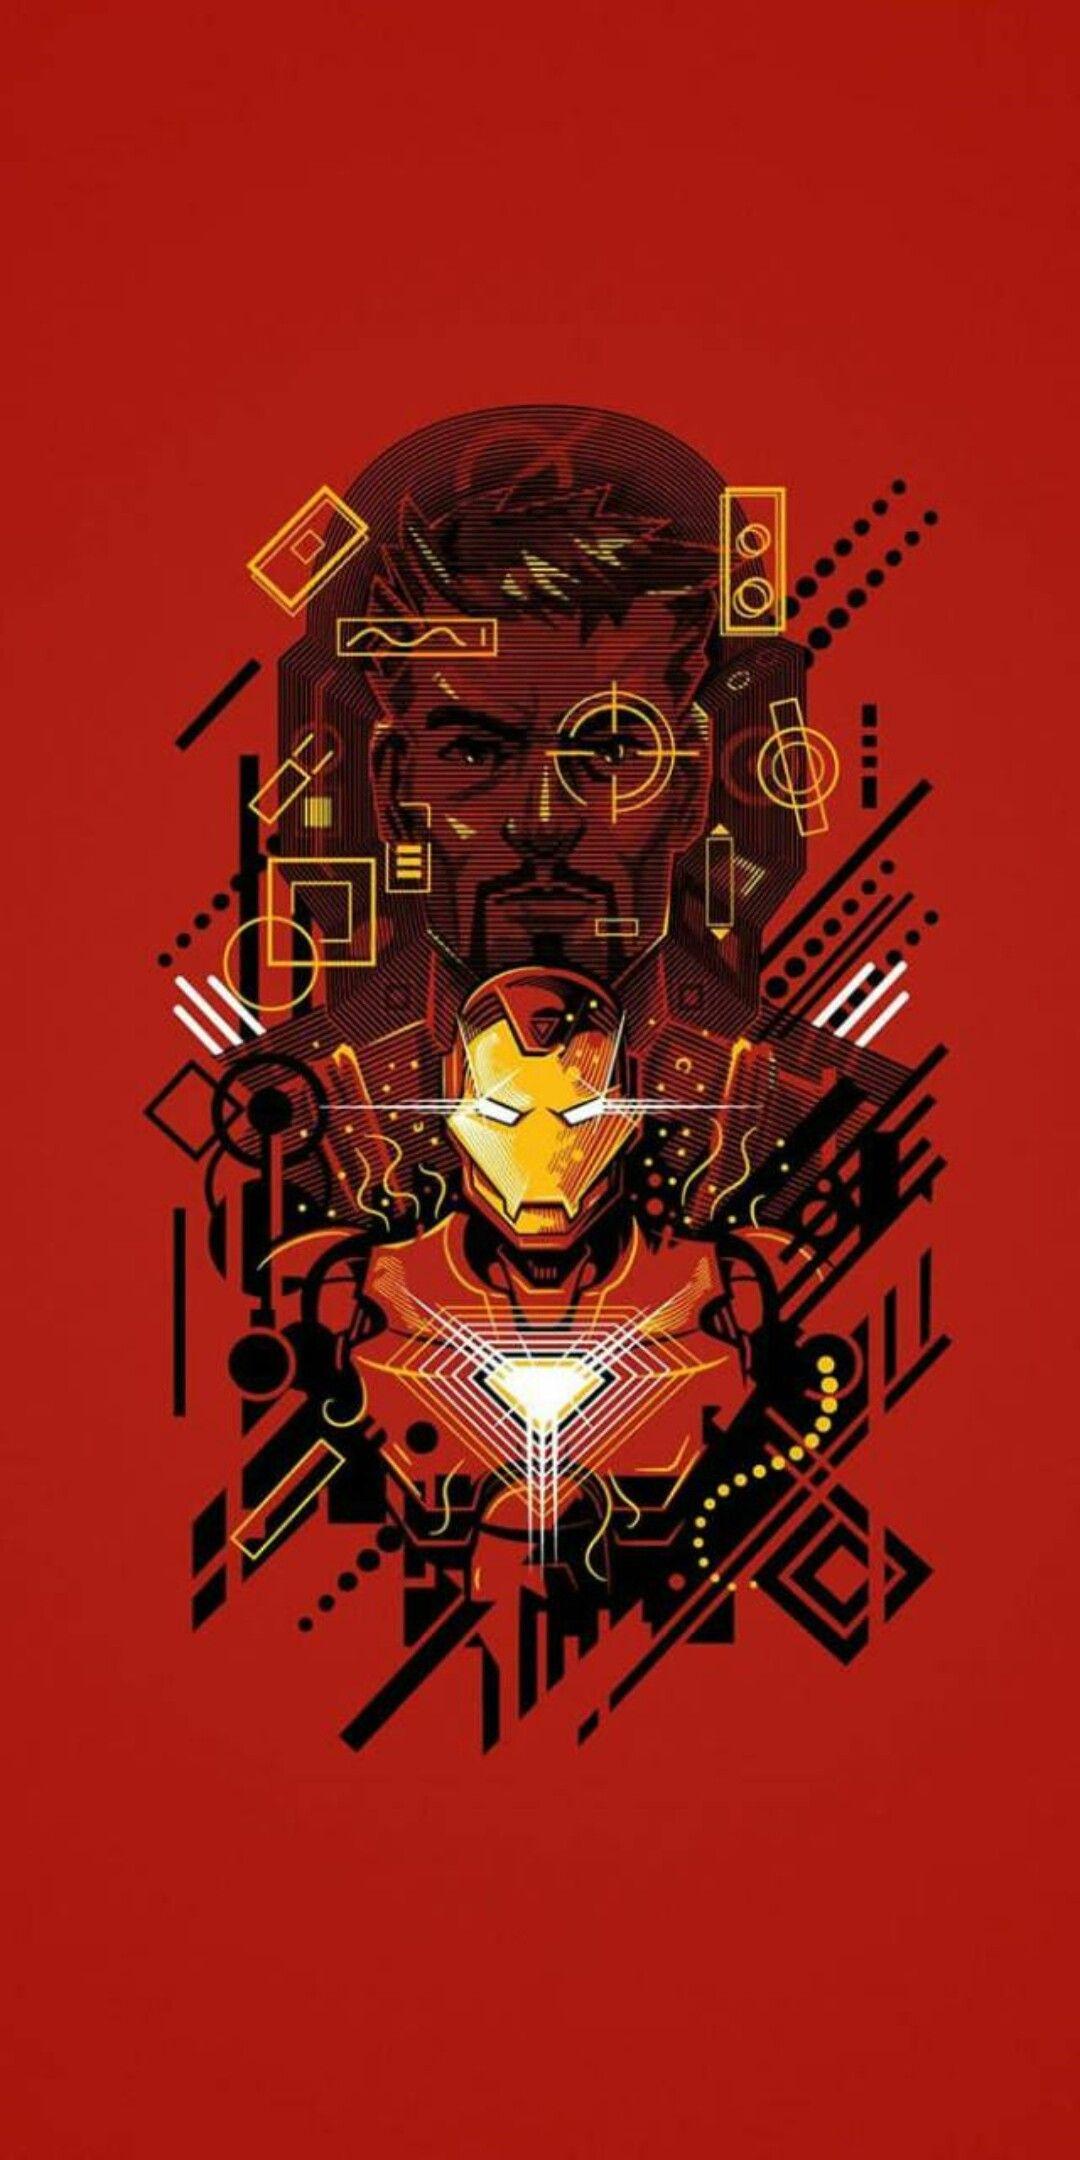 Tony Stark a.k.a. Iron Man marvel Fondo de pantalla de